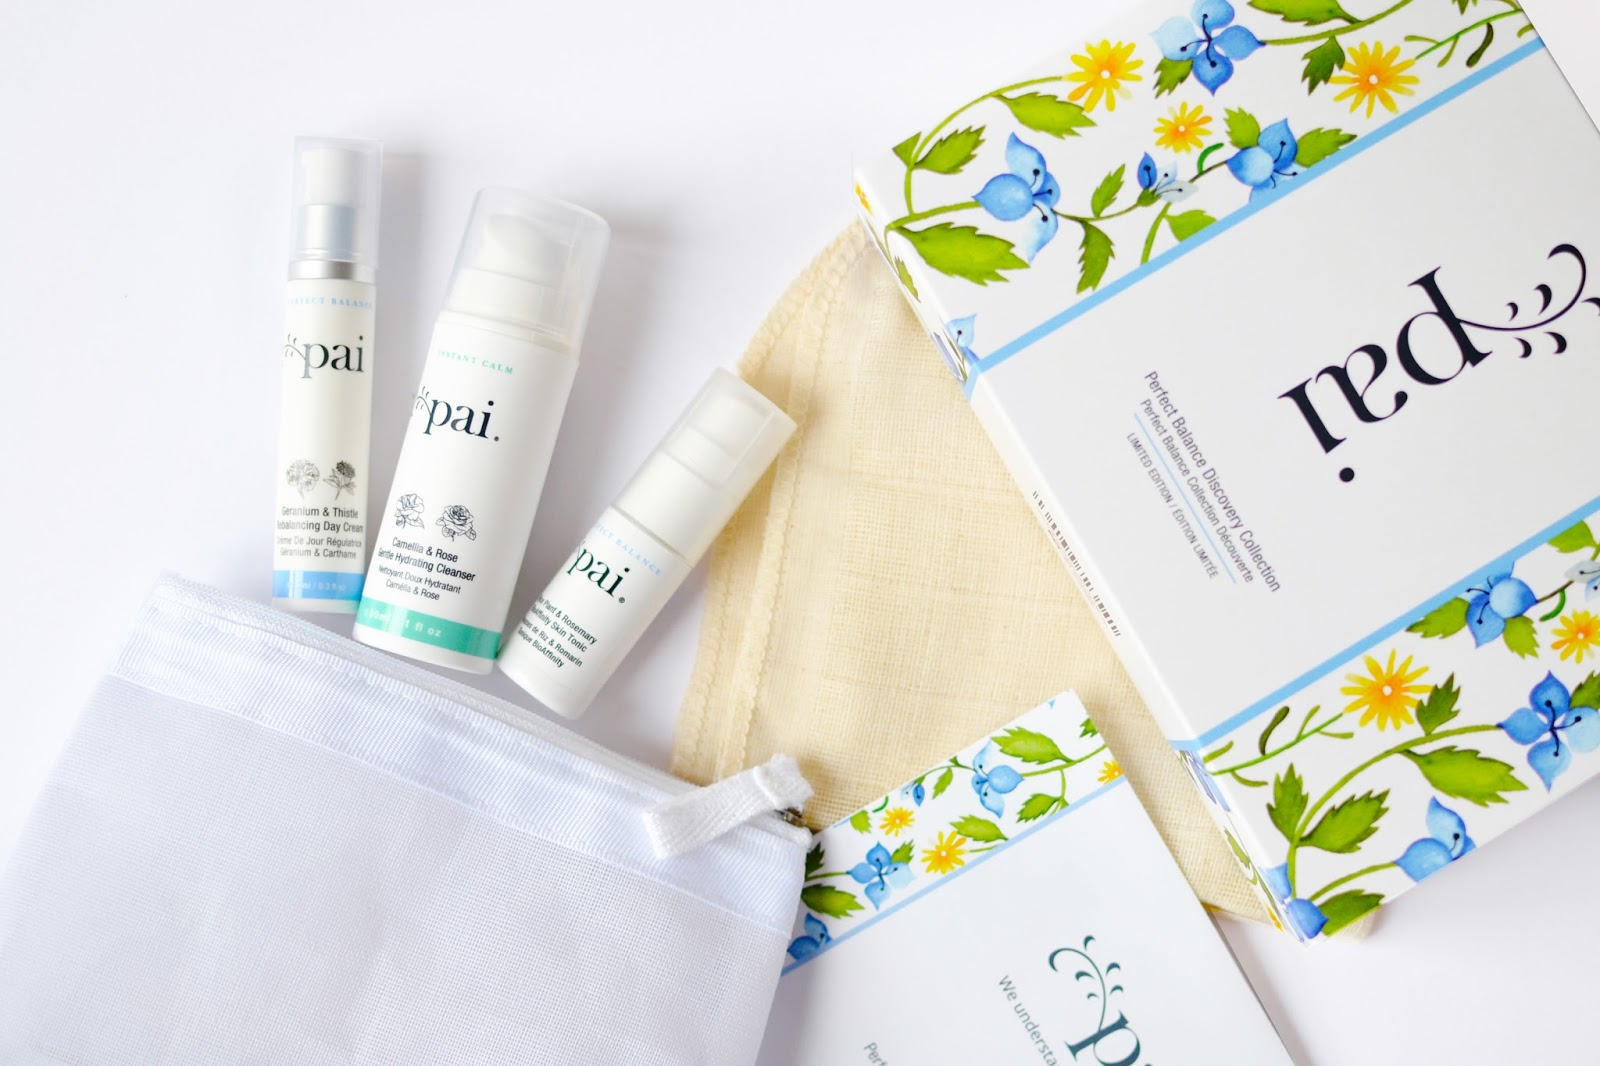 Pai Skincare for sensitive skin